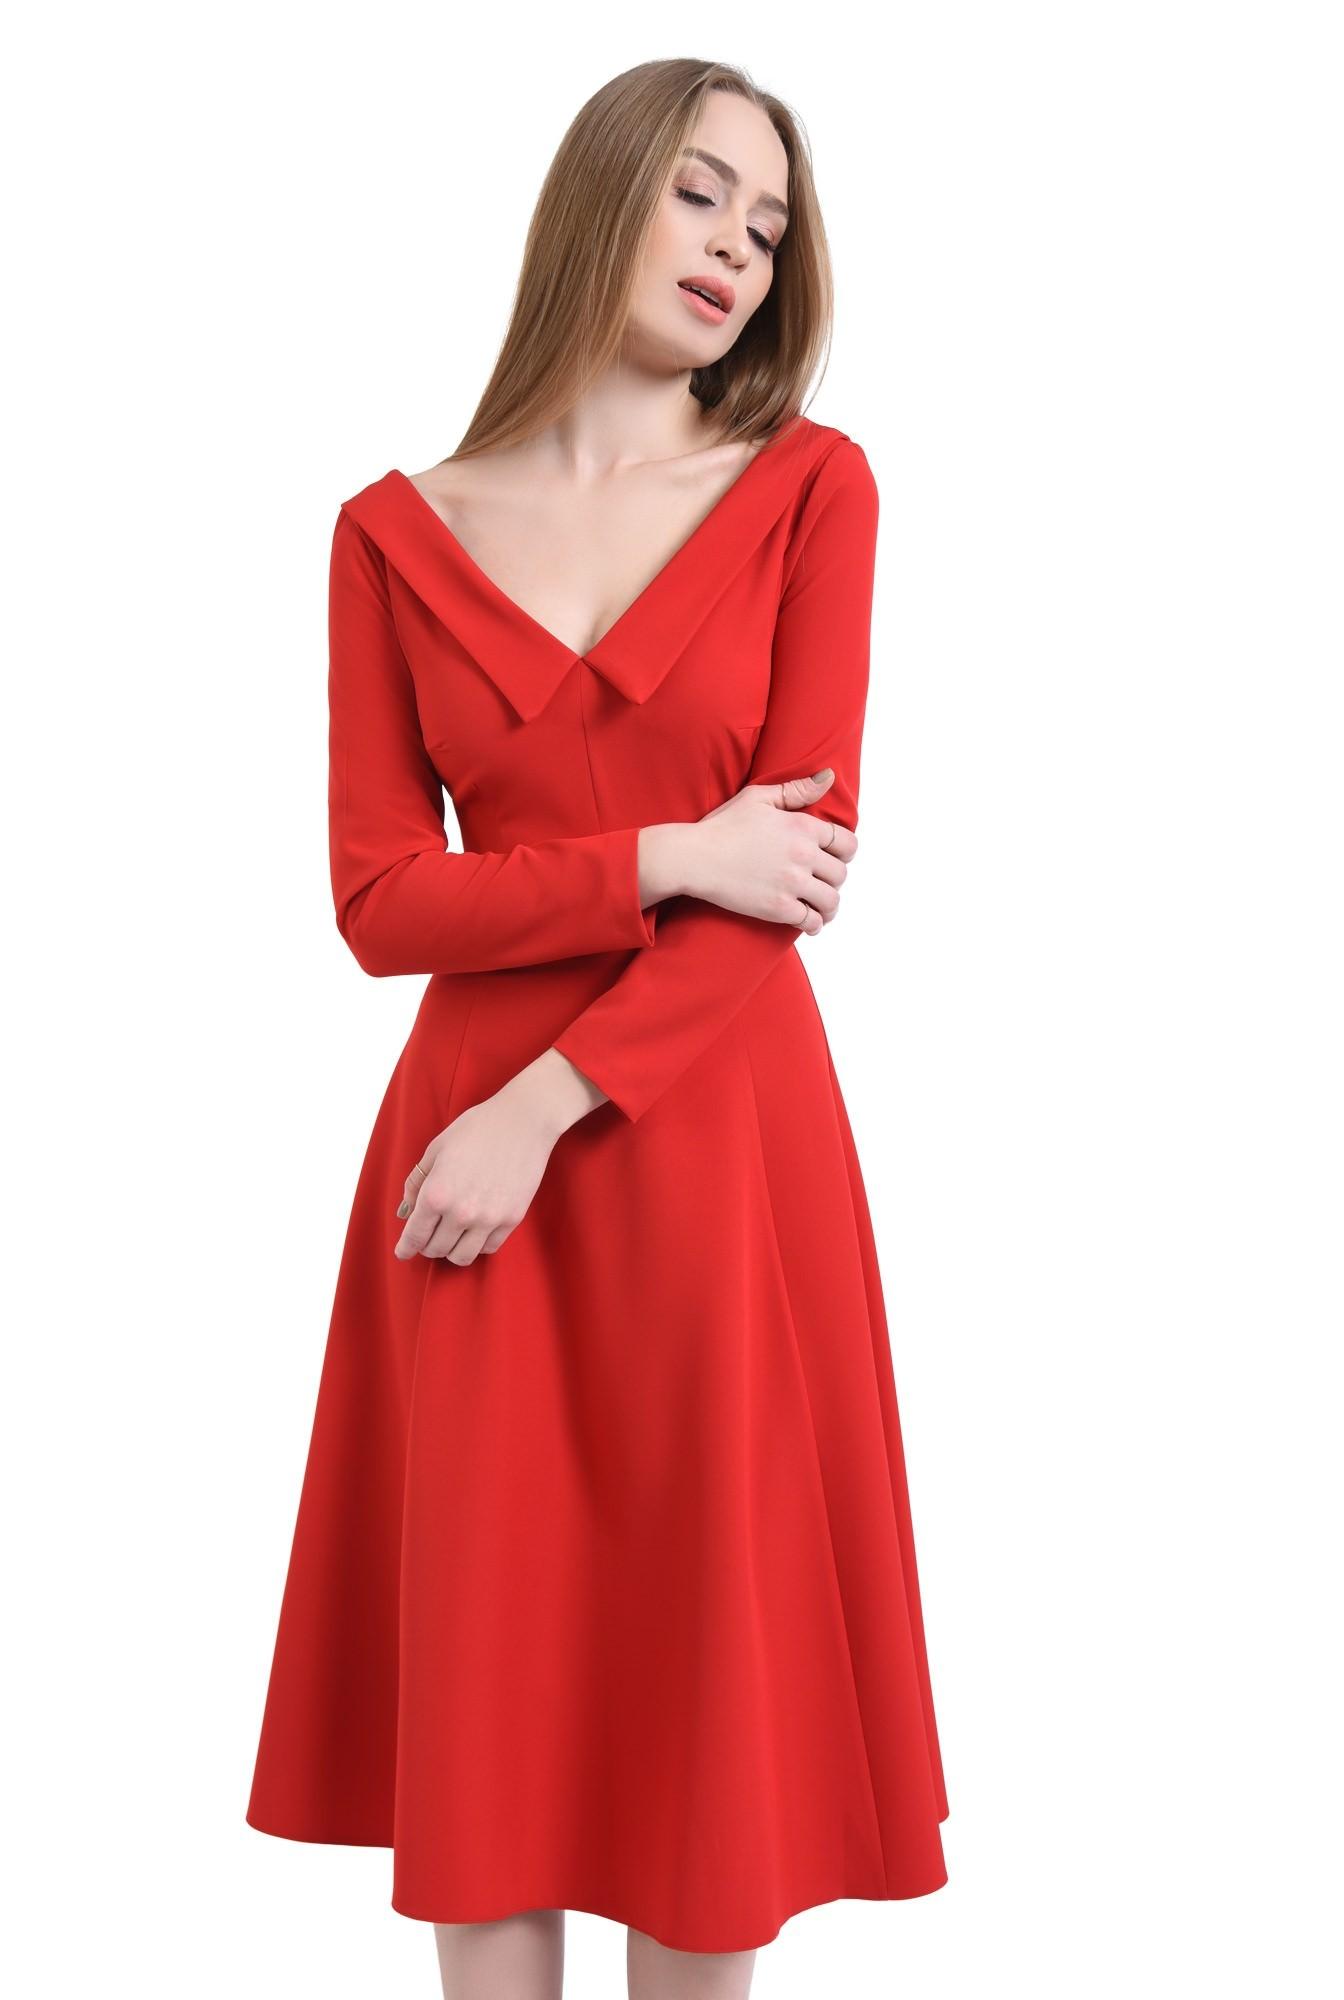 0 - Rochie de zi rosie, cloche